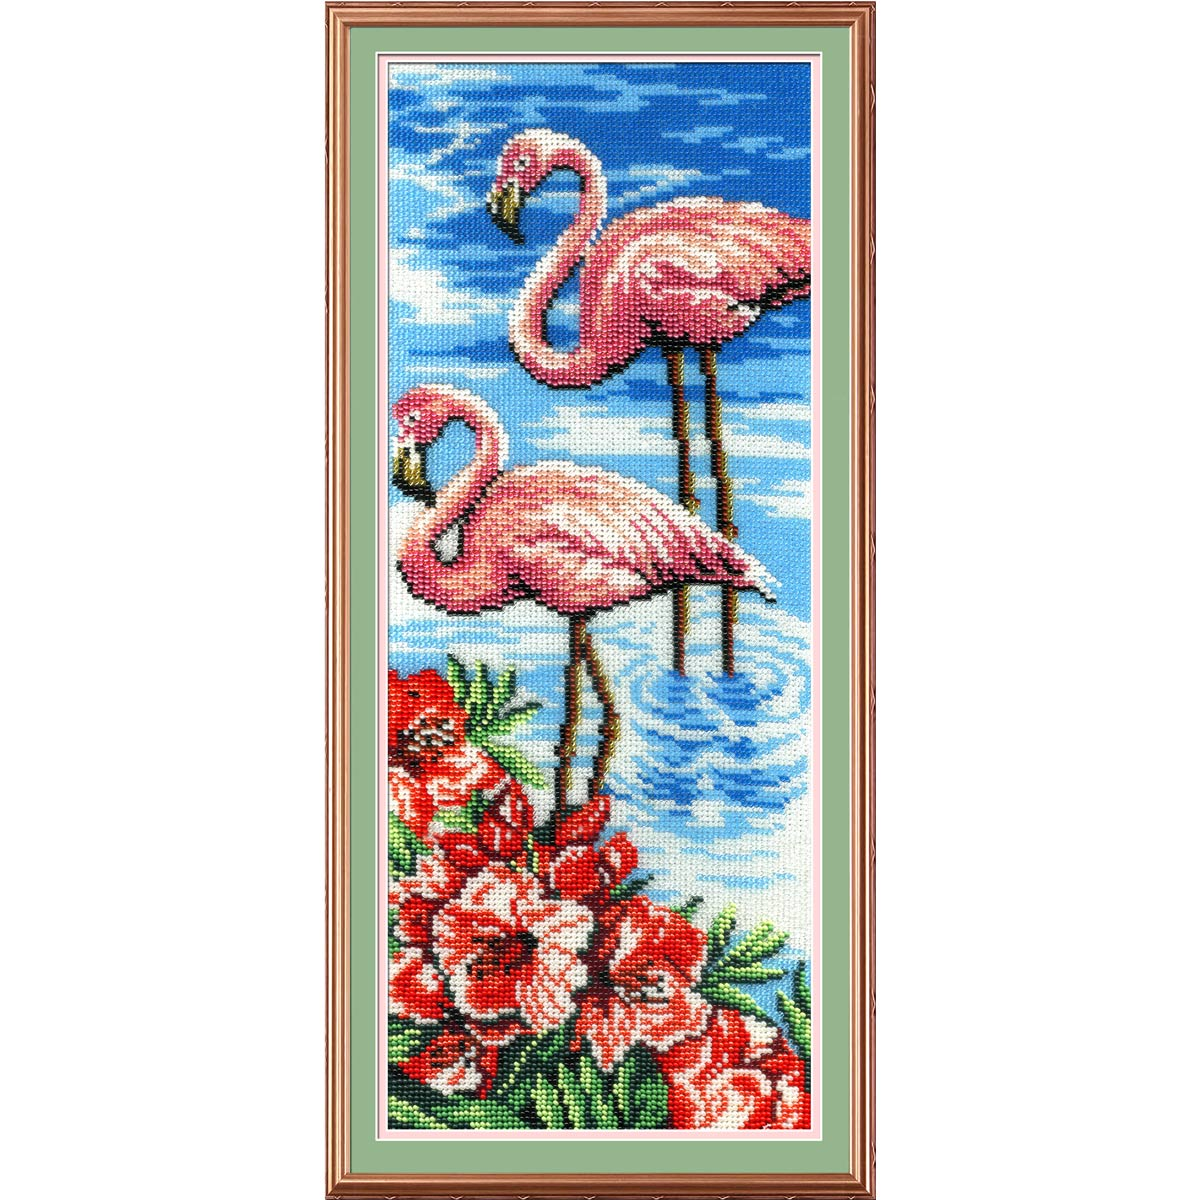 БГ-181 Набор для вышивания 'МП Студия' 'Фламинго', 40х15 см